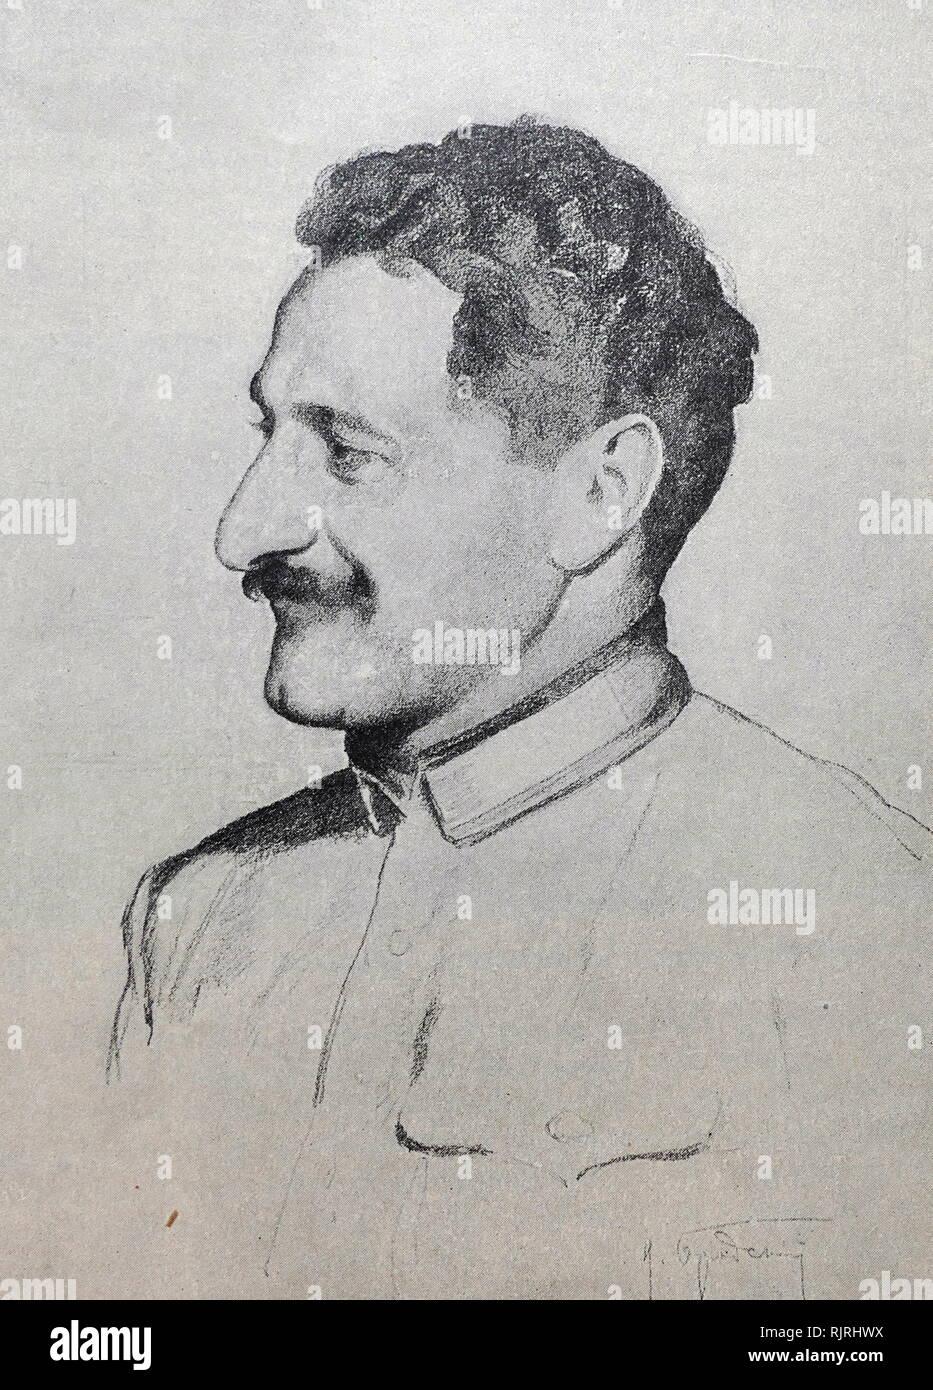 Grigori Ordzhonikidze (better known as Sergo Ordzhonikidze) (1886-1937), Georgian Bolshevik and Soviet political leader - Stock Image